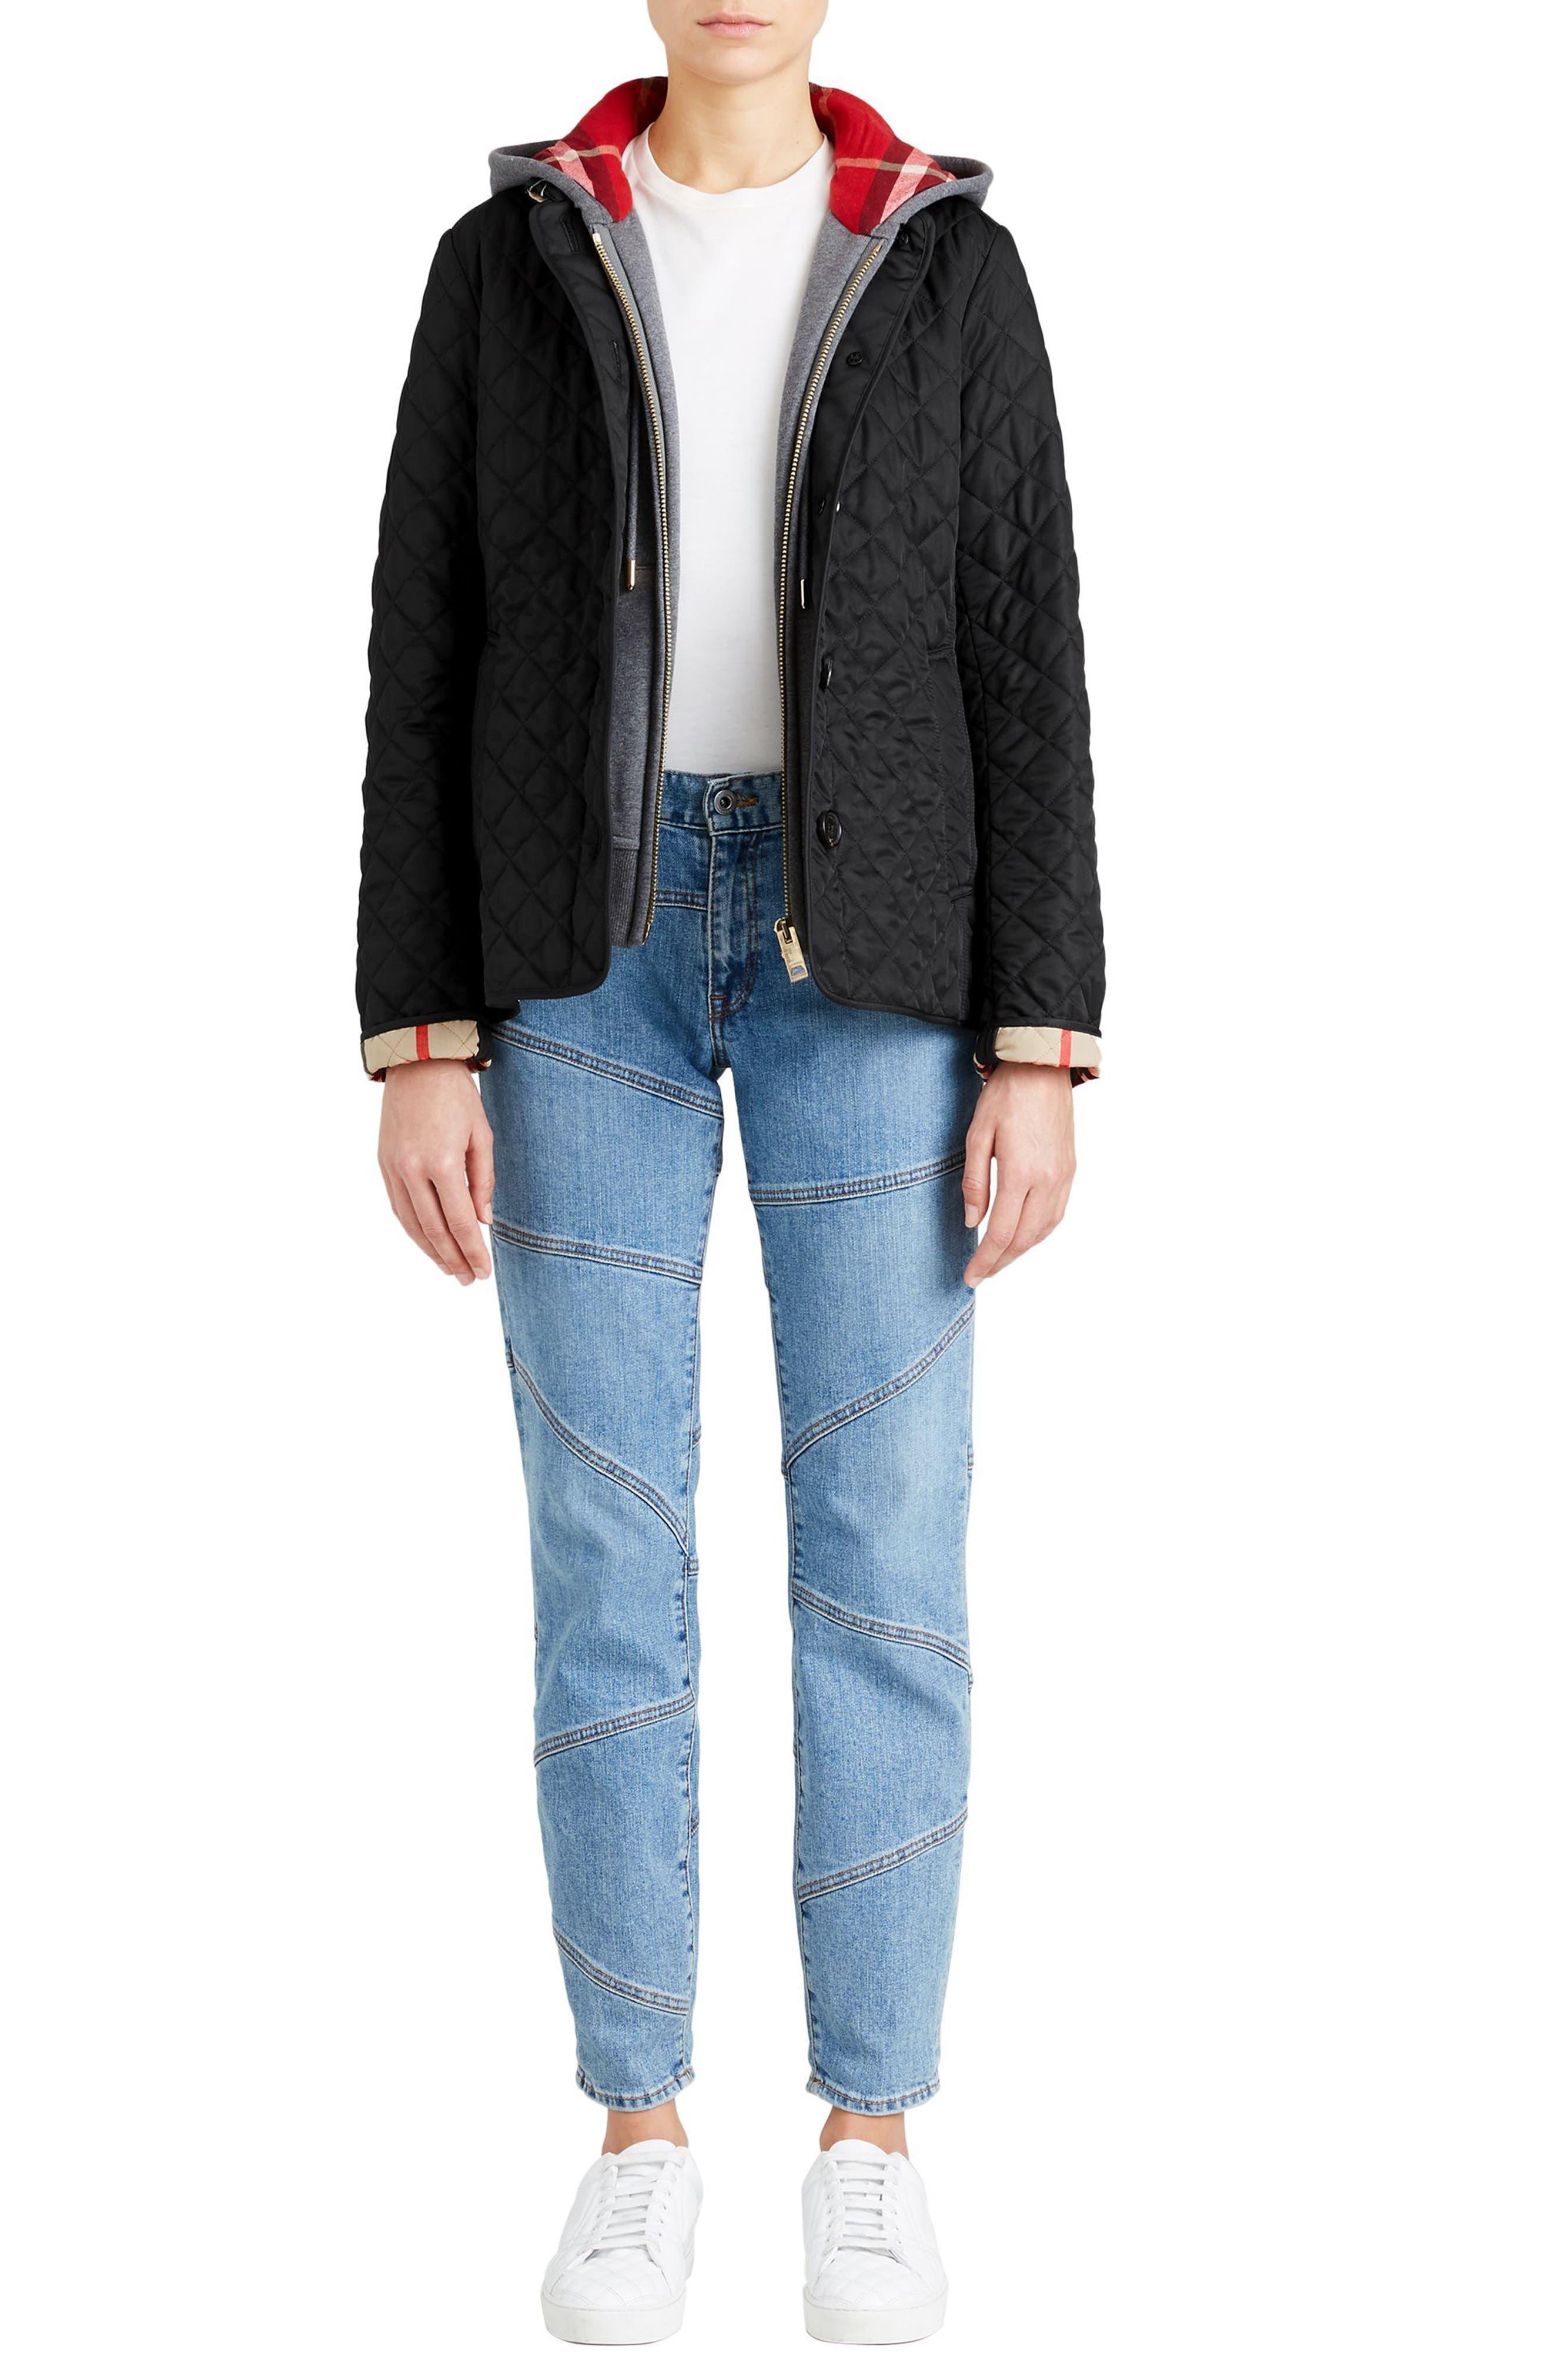 Ashurst Quilted Jacket,                             Alternate thumbnail 12, color,                             BLACK